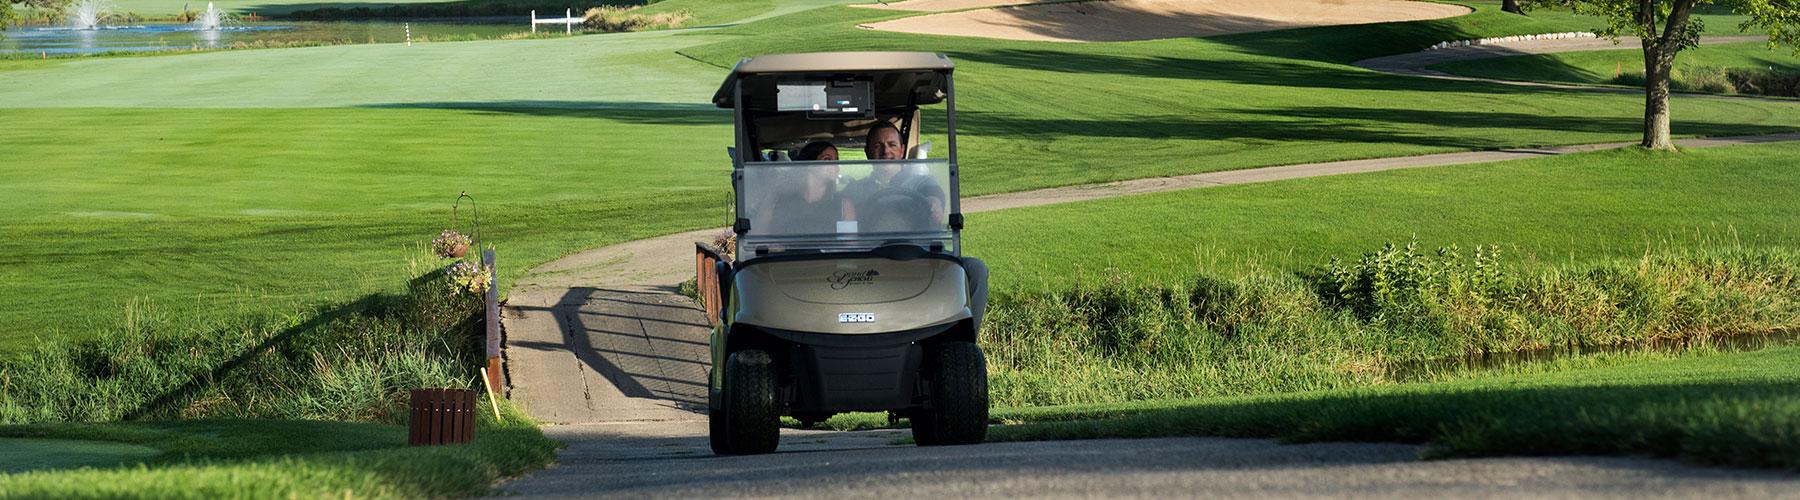 Golf Cart Crew